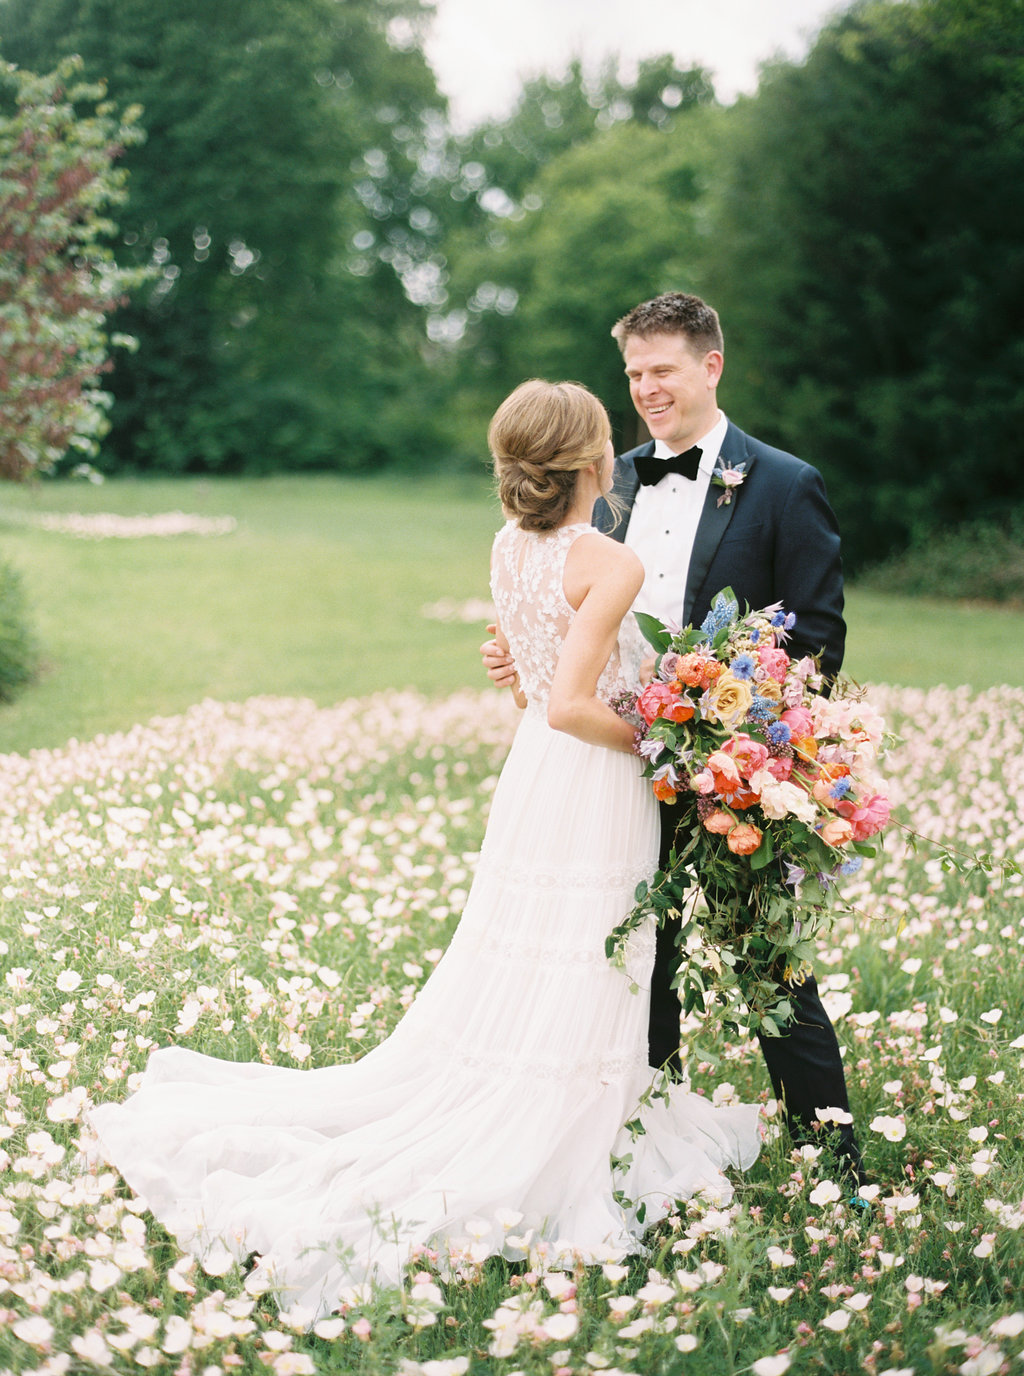 Colorful Farm-to-Table wedding featured in   Martha Stewart Weddings